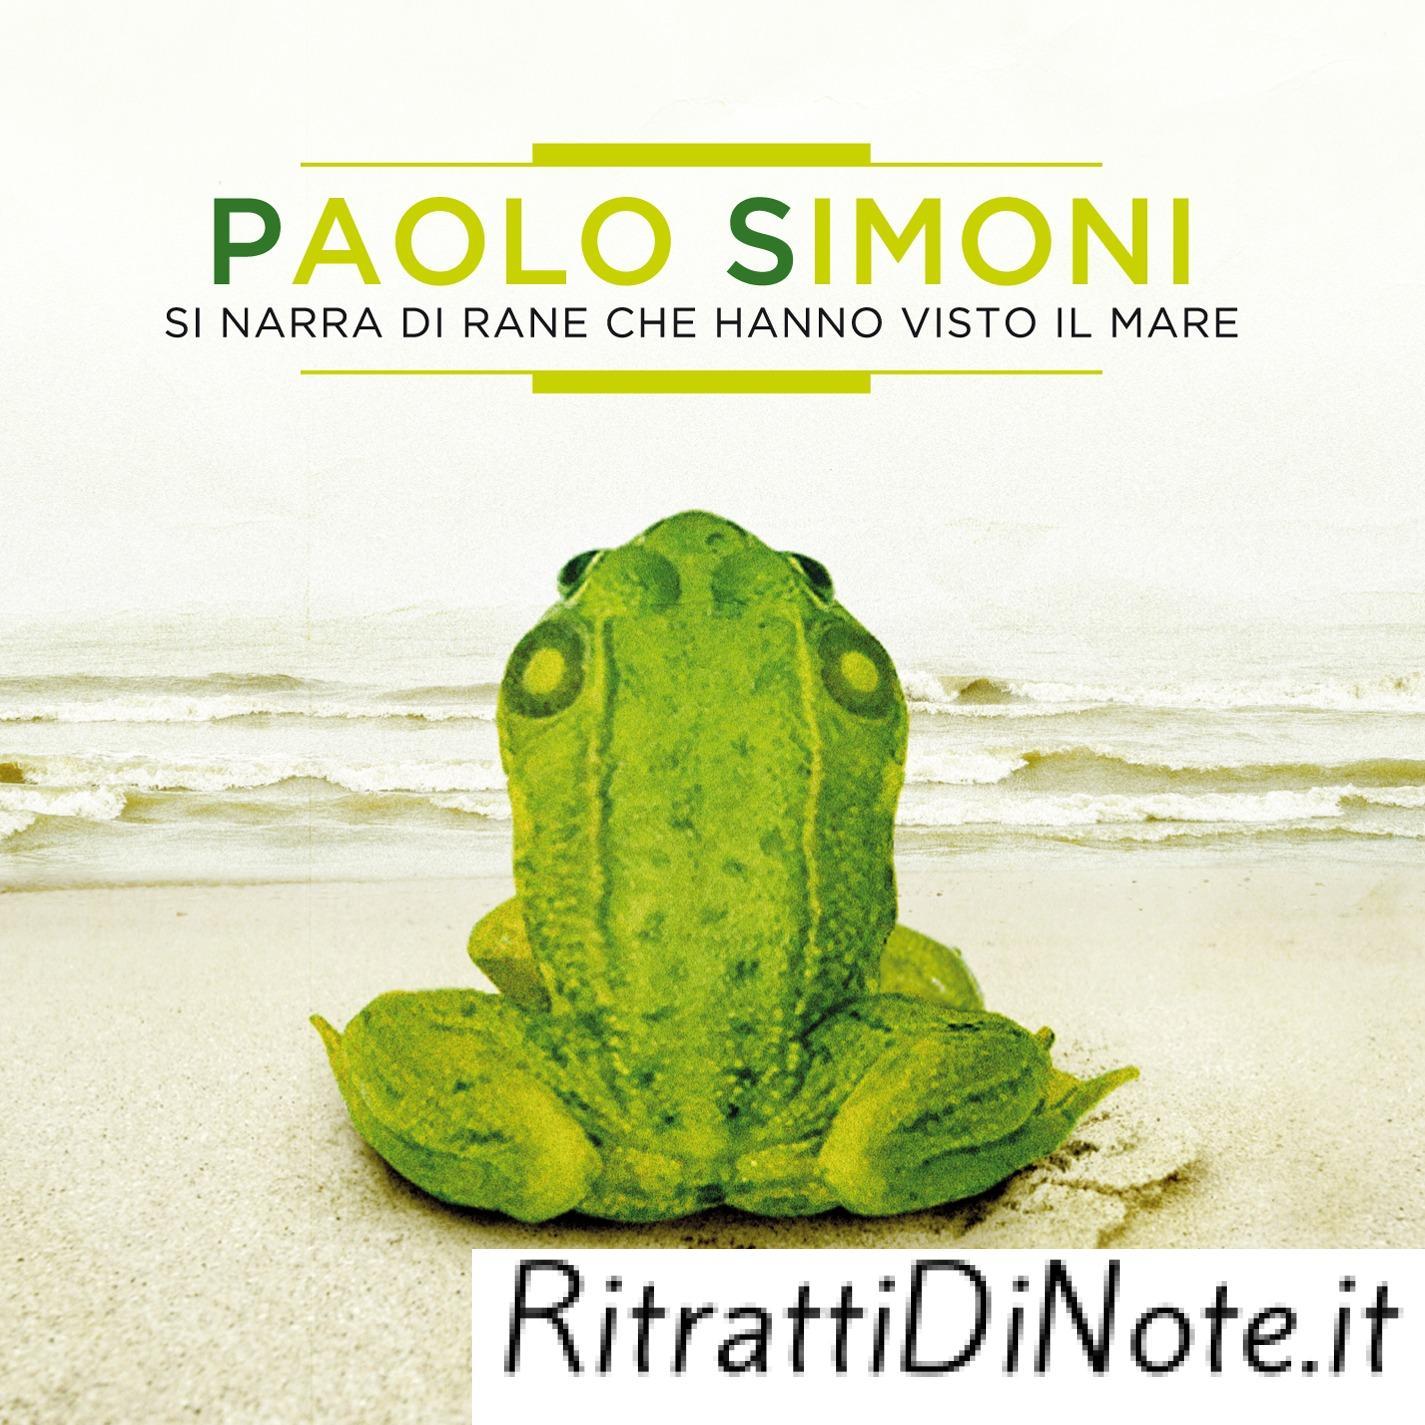 Cover album_PAOLO SIMONI_media